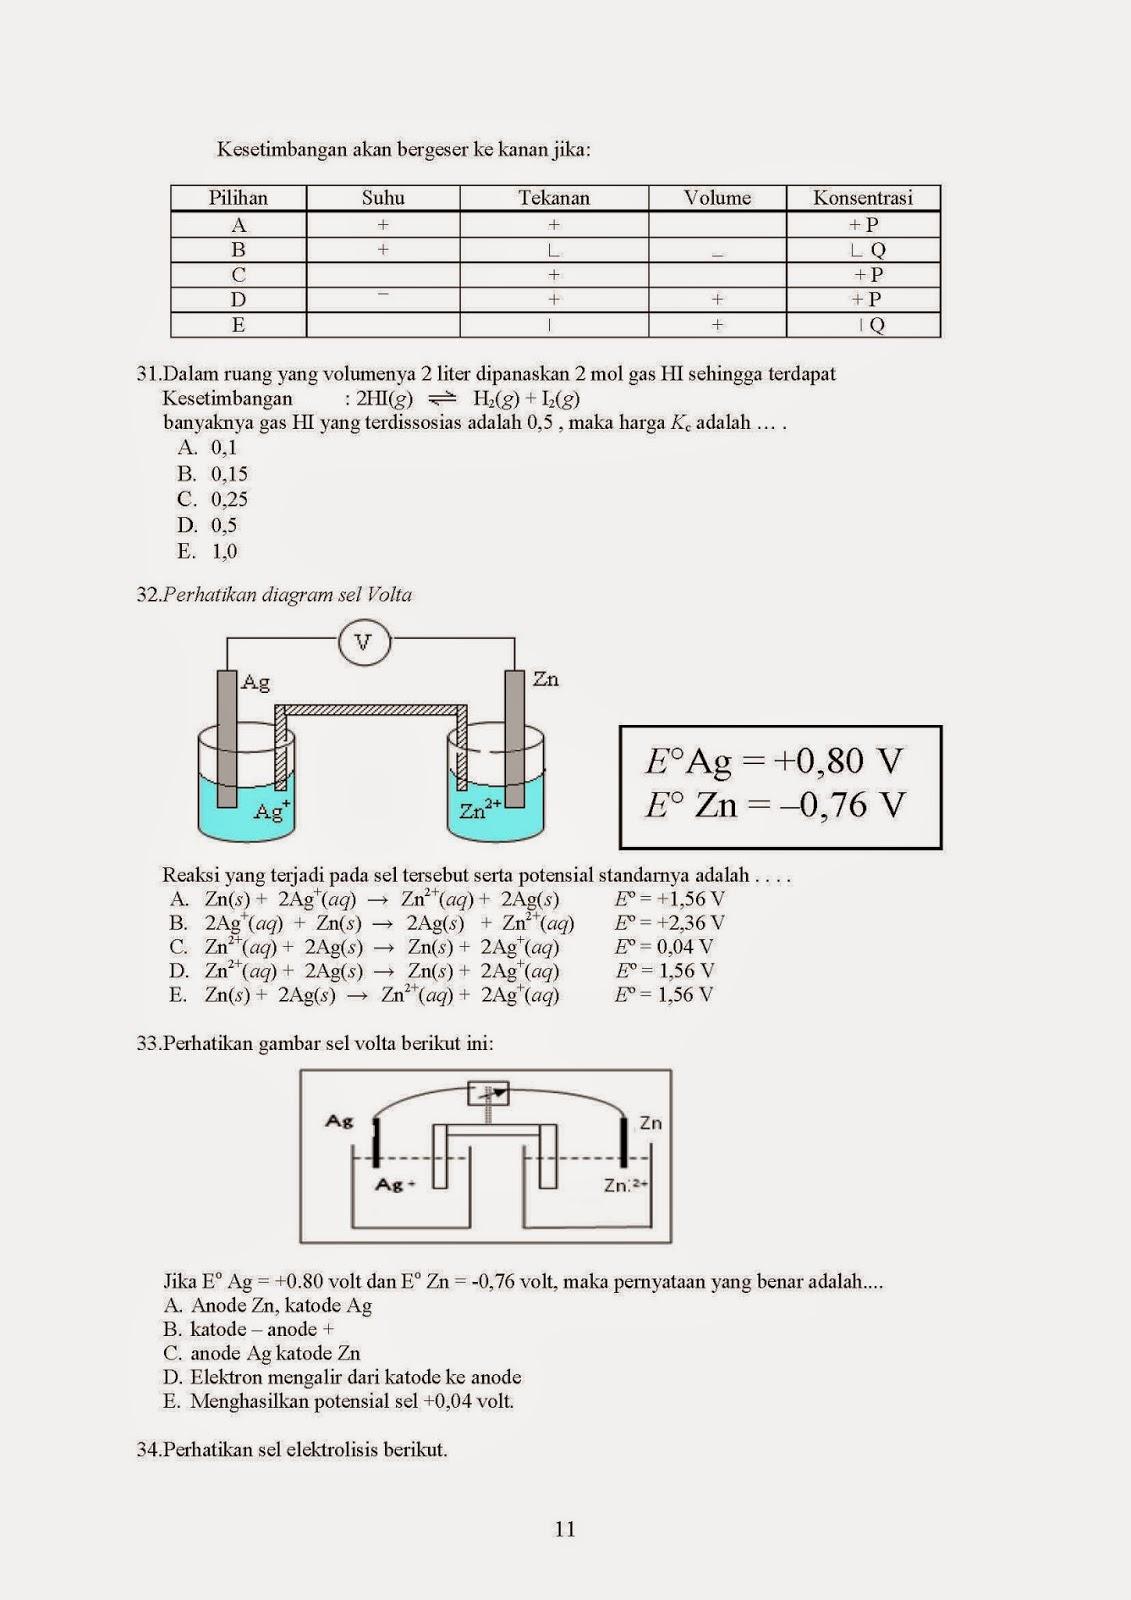 Kunci Jawaban Tryout Ipa 2014 Soal Un Try Out Us Biologi Paket 1 Kelas 9 Smp Ta 2012 Soal